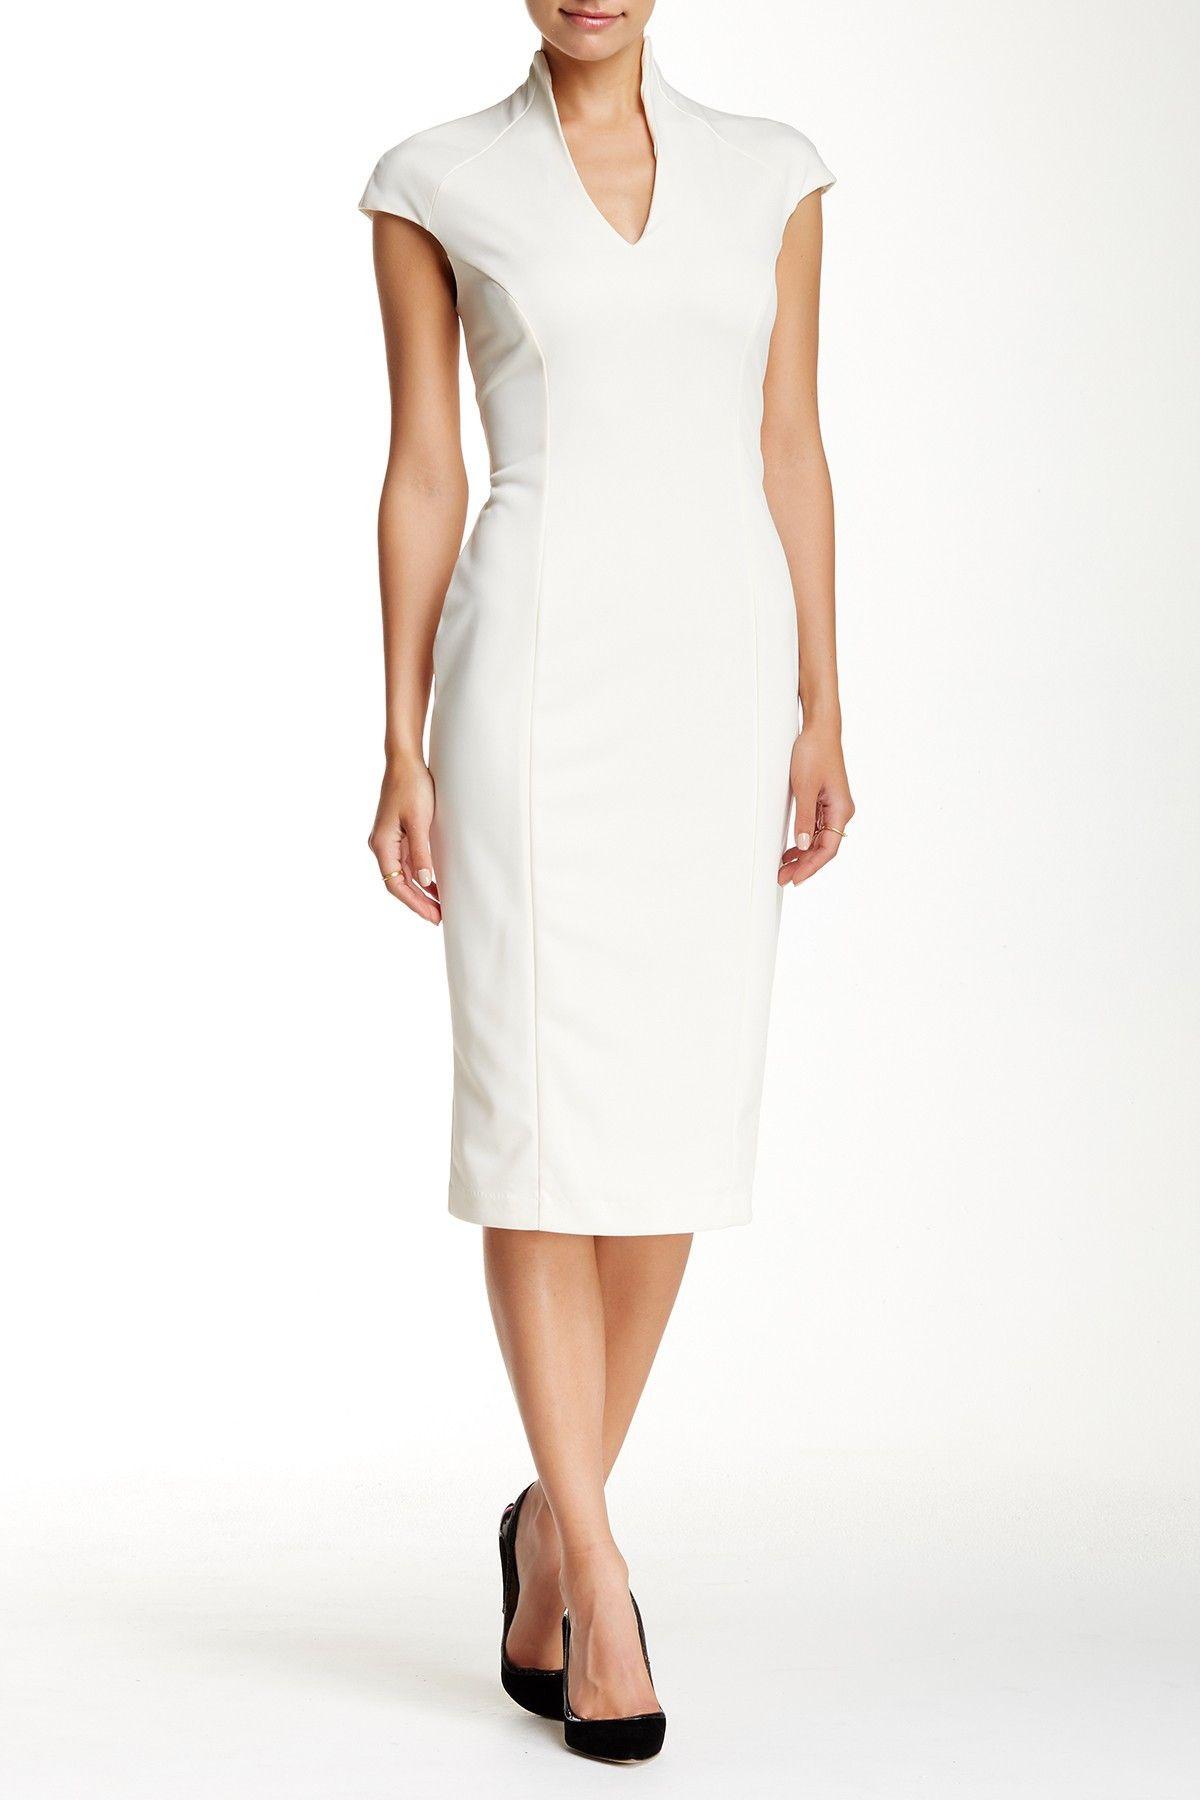 Alexia Admor Scuba Midi Sheath Dress Nordstrom Rack V Neck Midi Dress Midi Sheath Dress Sheath Dress [ 1800 x 1200 Pixel ]